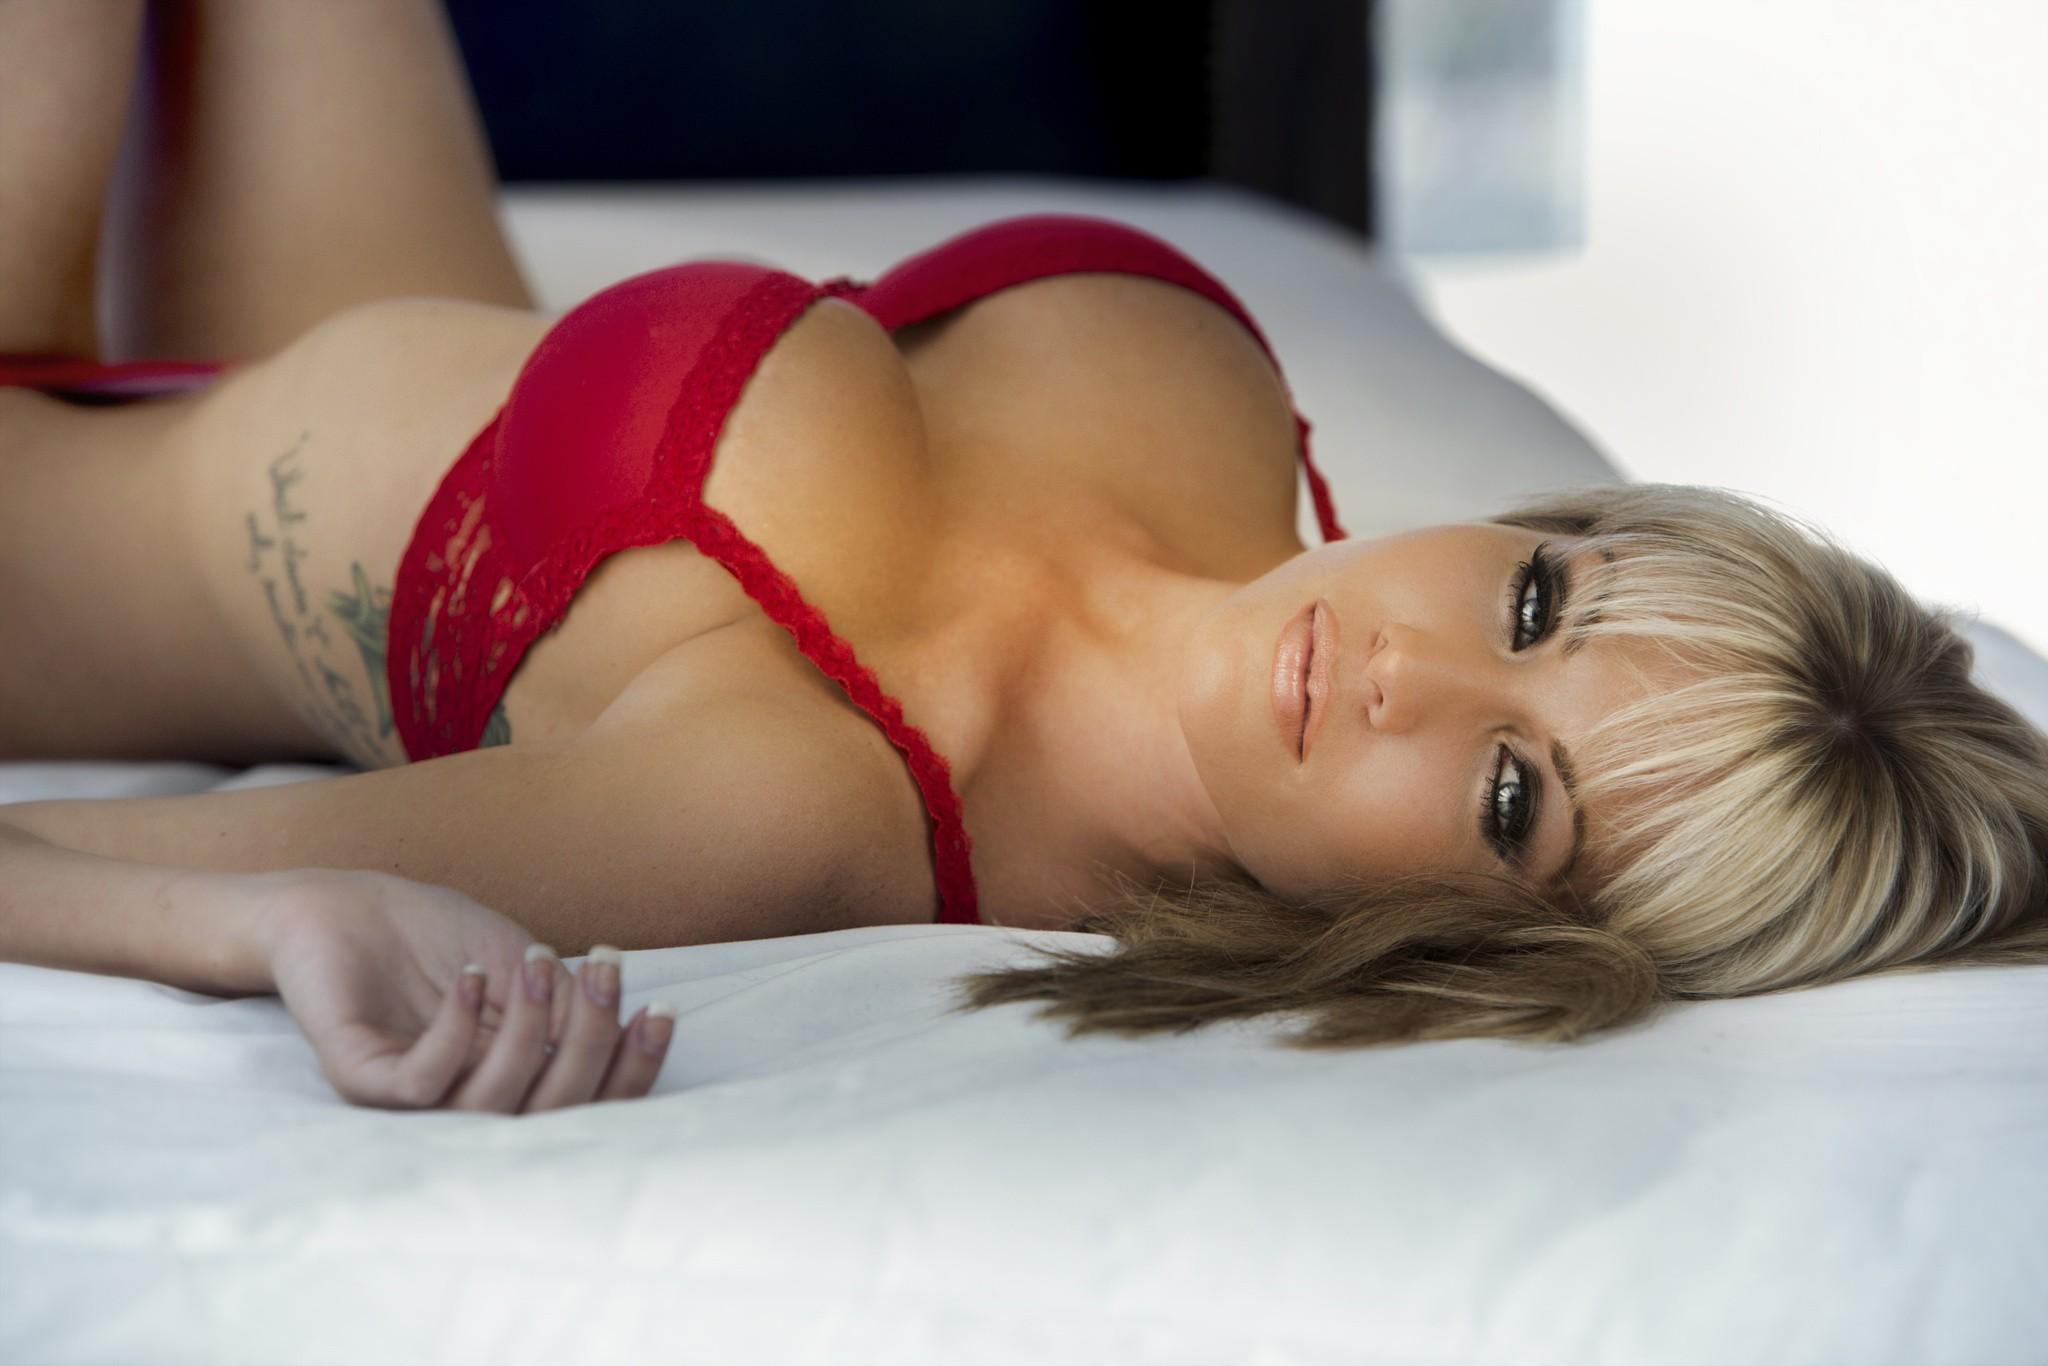 seks-foto-blondinok-s-bolshimi-siskami